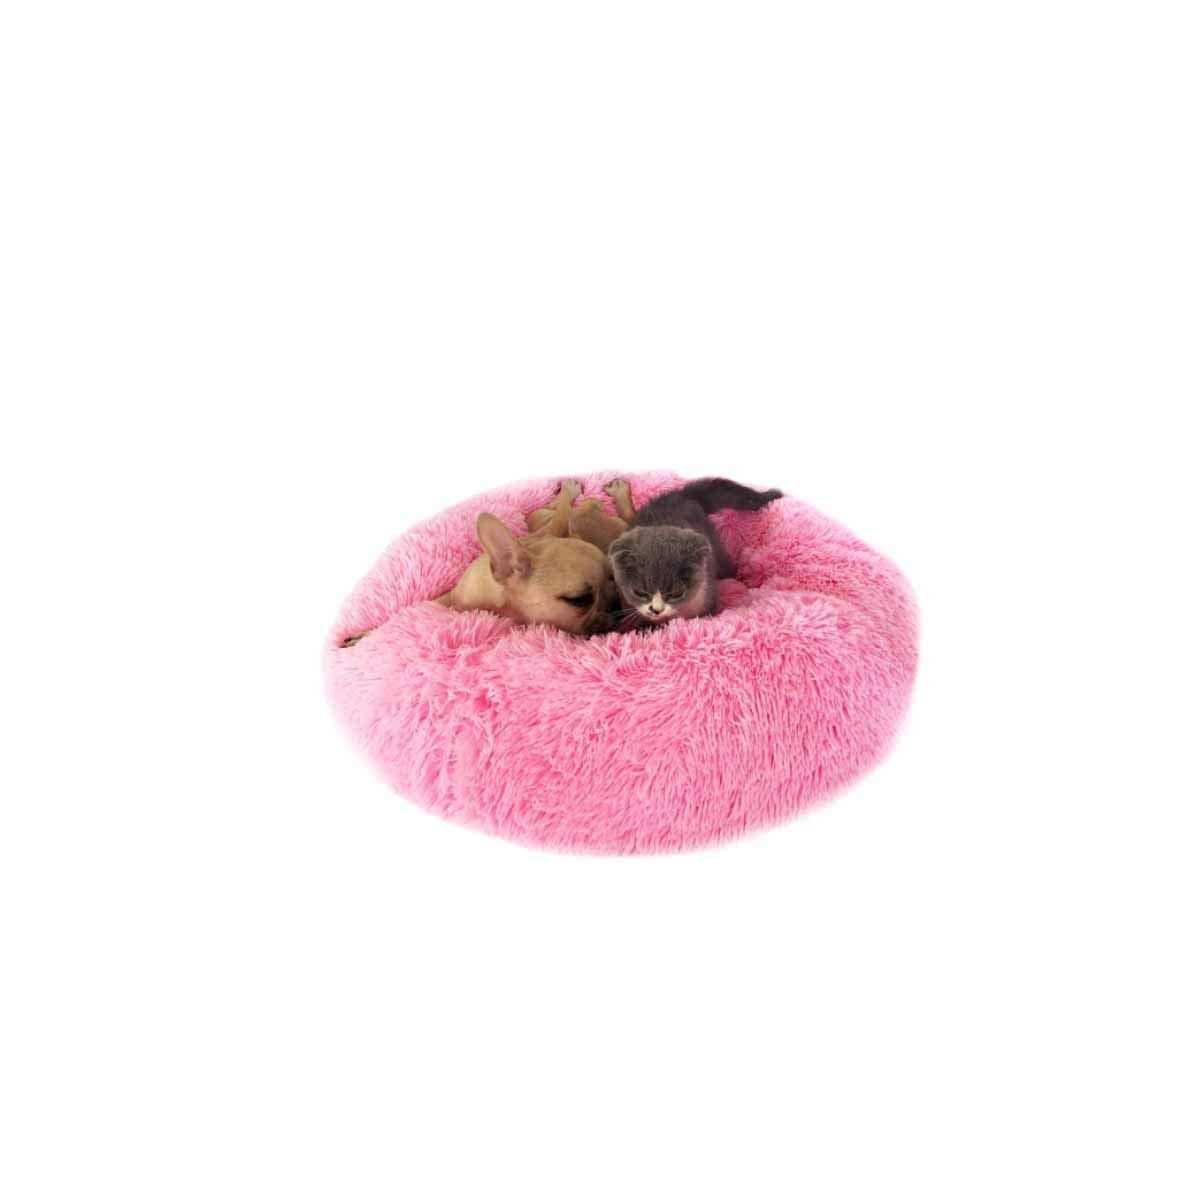 Beige SMuziwenju Kennel, Cat Litter, Warm Deep Sleep Cat Litter, Round Plush Autumn and Winter Pet Nest, Red OD 70CM (color   Beige, Size   S)